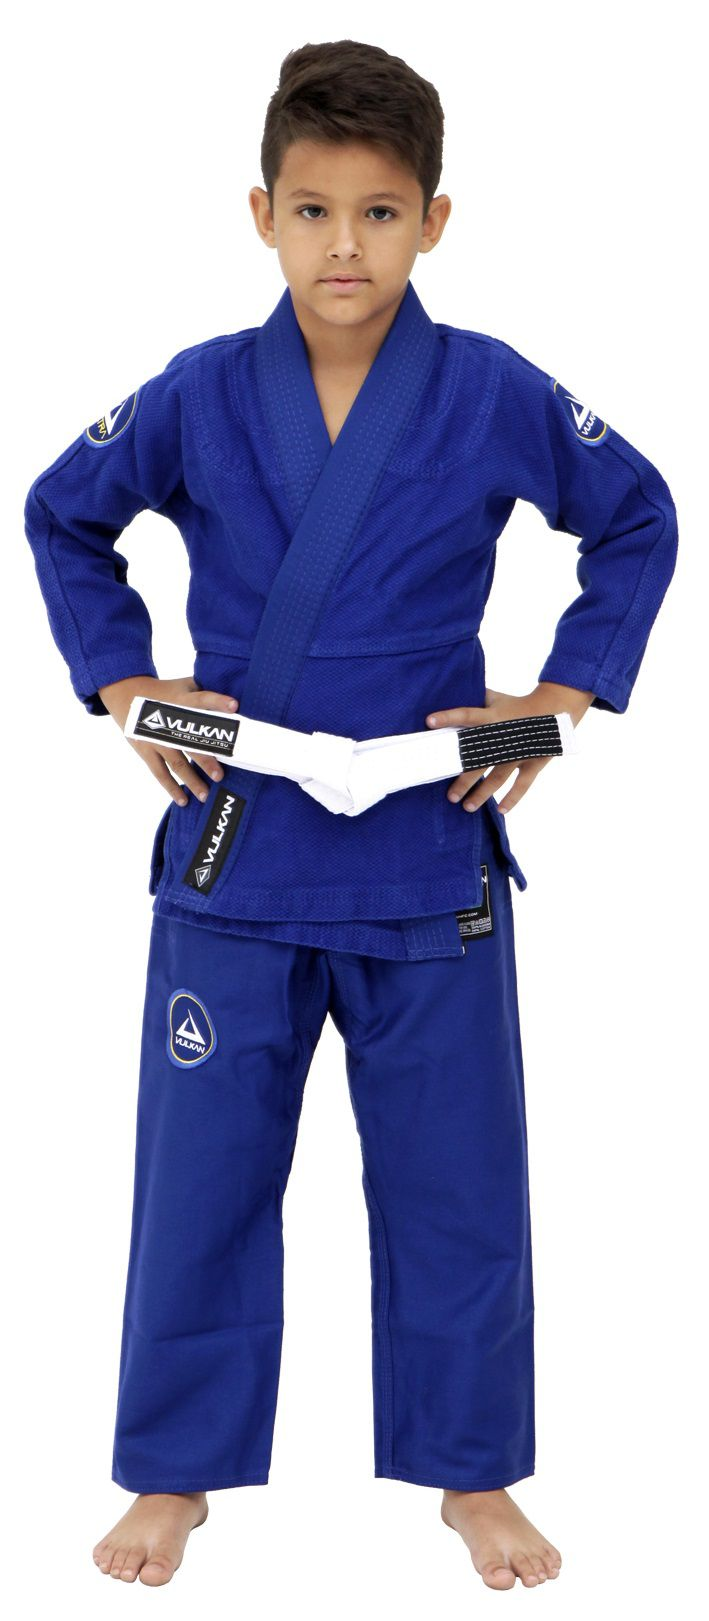 Kimono Vulkan Para Jiu-jitsu Profissional Infantil - NEO ULTRA LIGHT AZUL